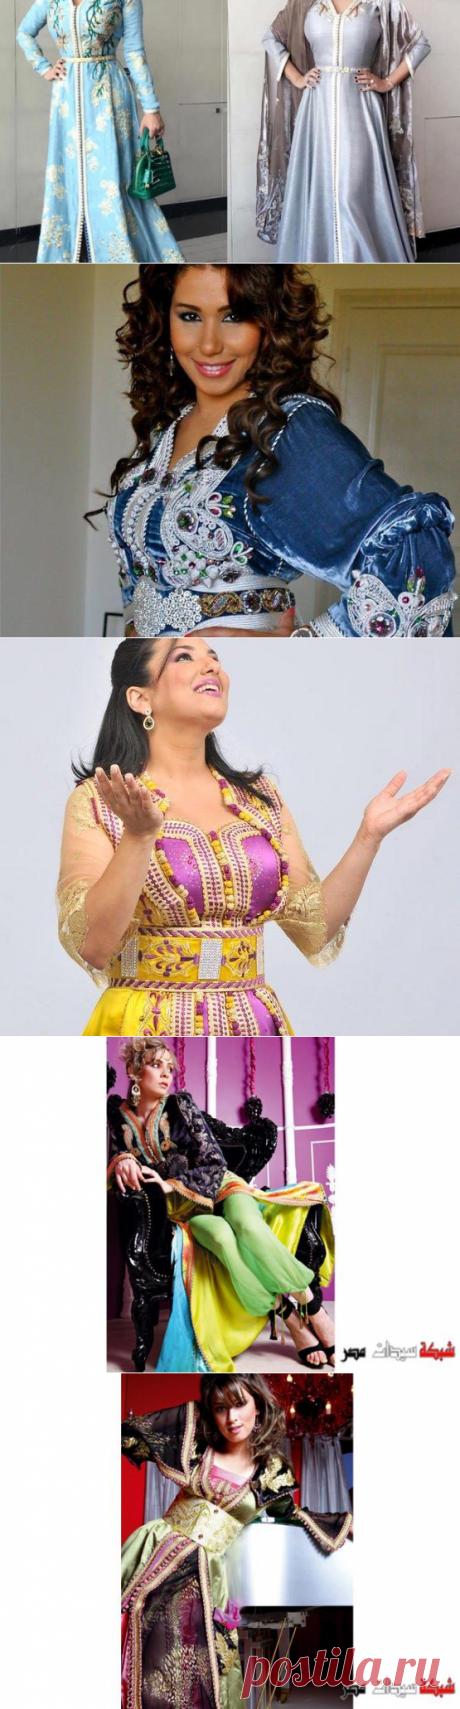 قفطان مغربي عصري – سيدات مصر